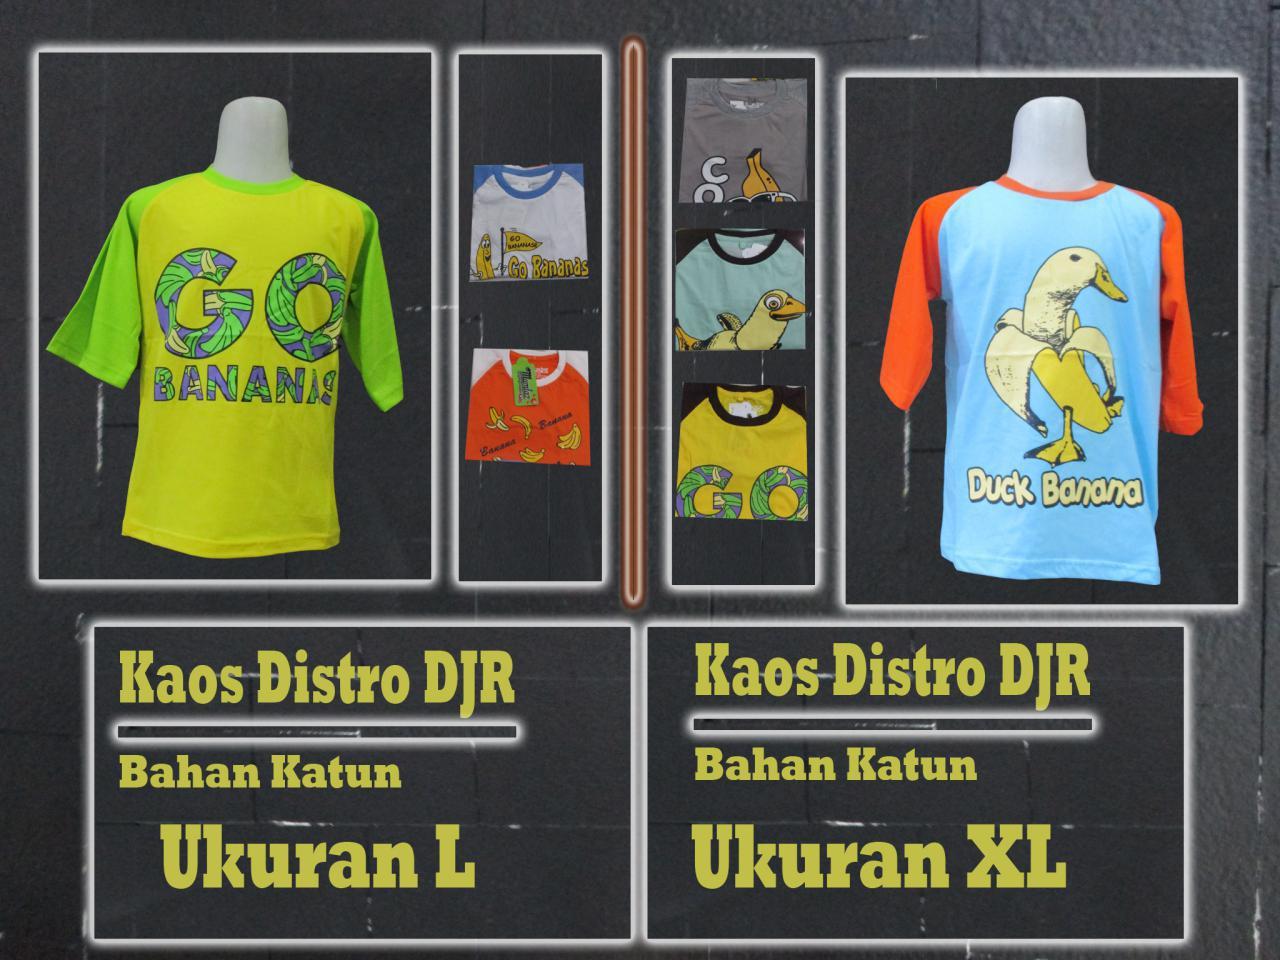 Pusat Grosir Baju Murah Solo Klewer 2021 Kulakan Kaos Distro Anak Murah 14ribuan